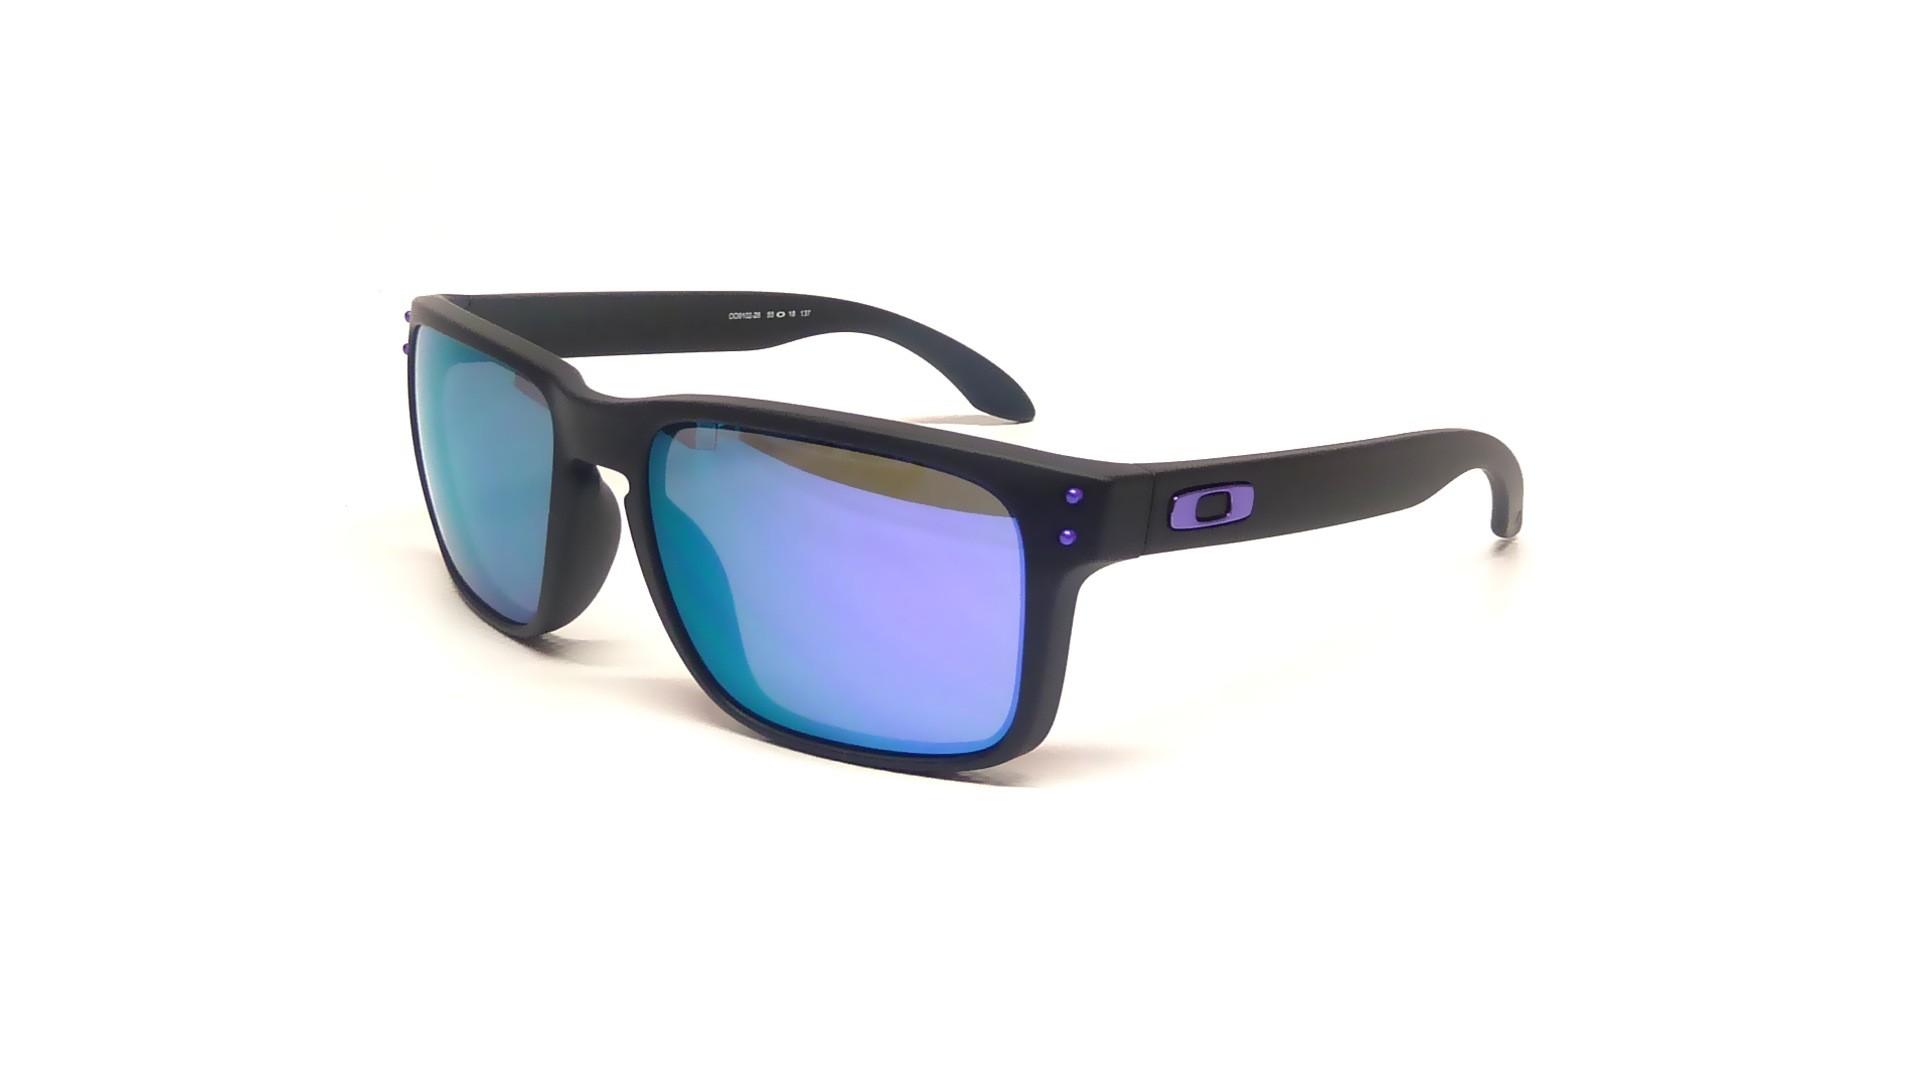 bb728c3a4b Sunglasses Oakley Holbrook Black OO9102 26 55-18 Medium Mirror